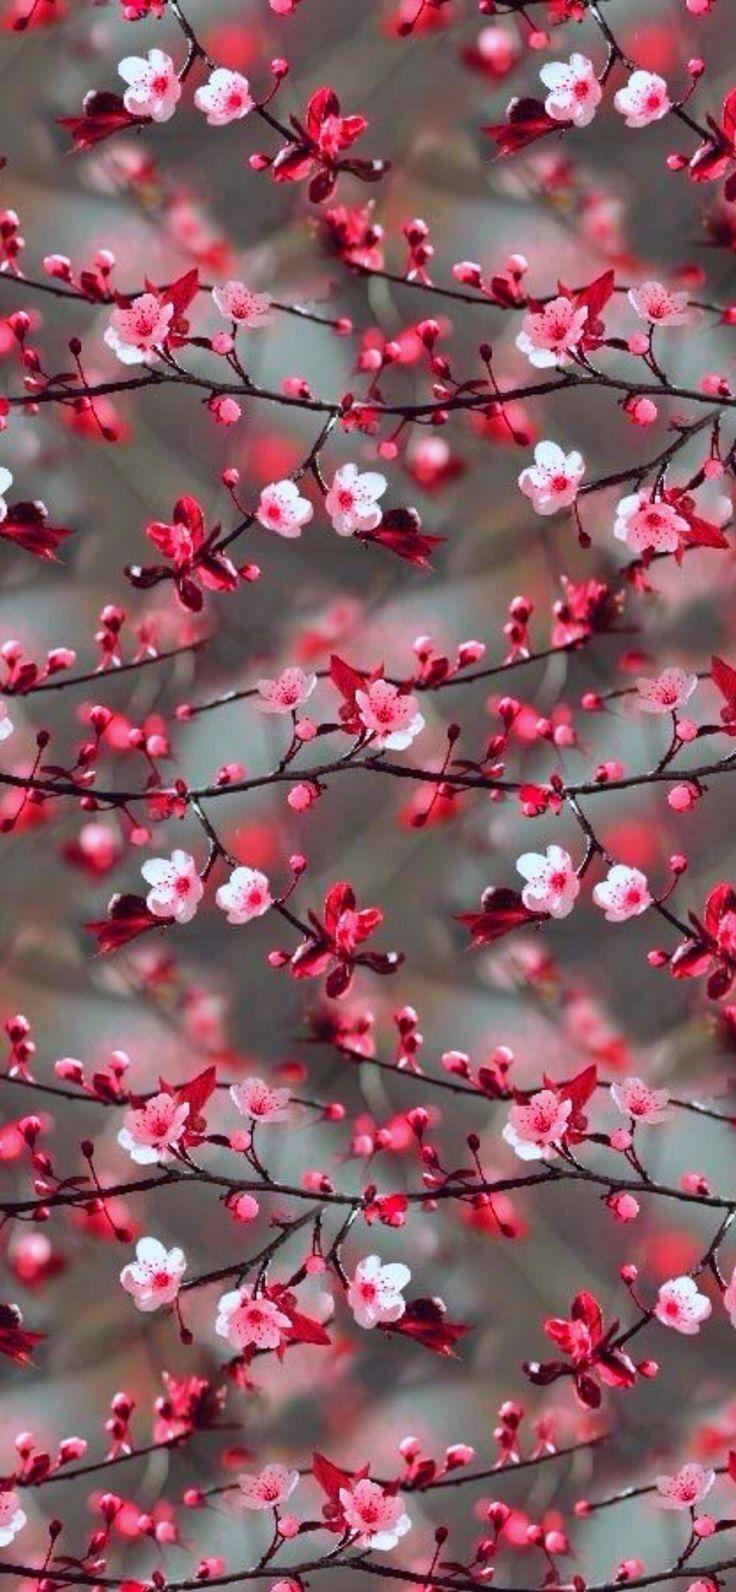 Me encantan las flores . 😁😍 629729960379068089 Beautiful